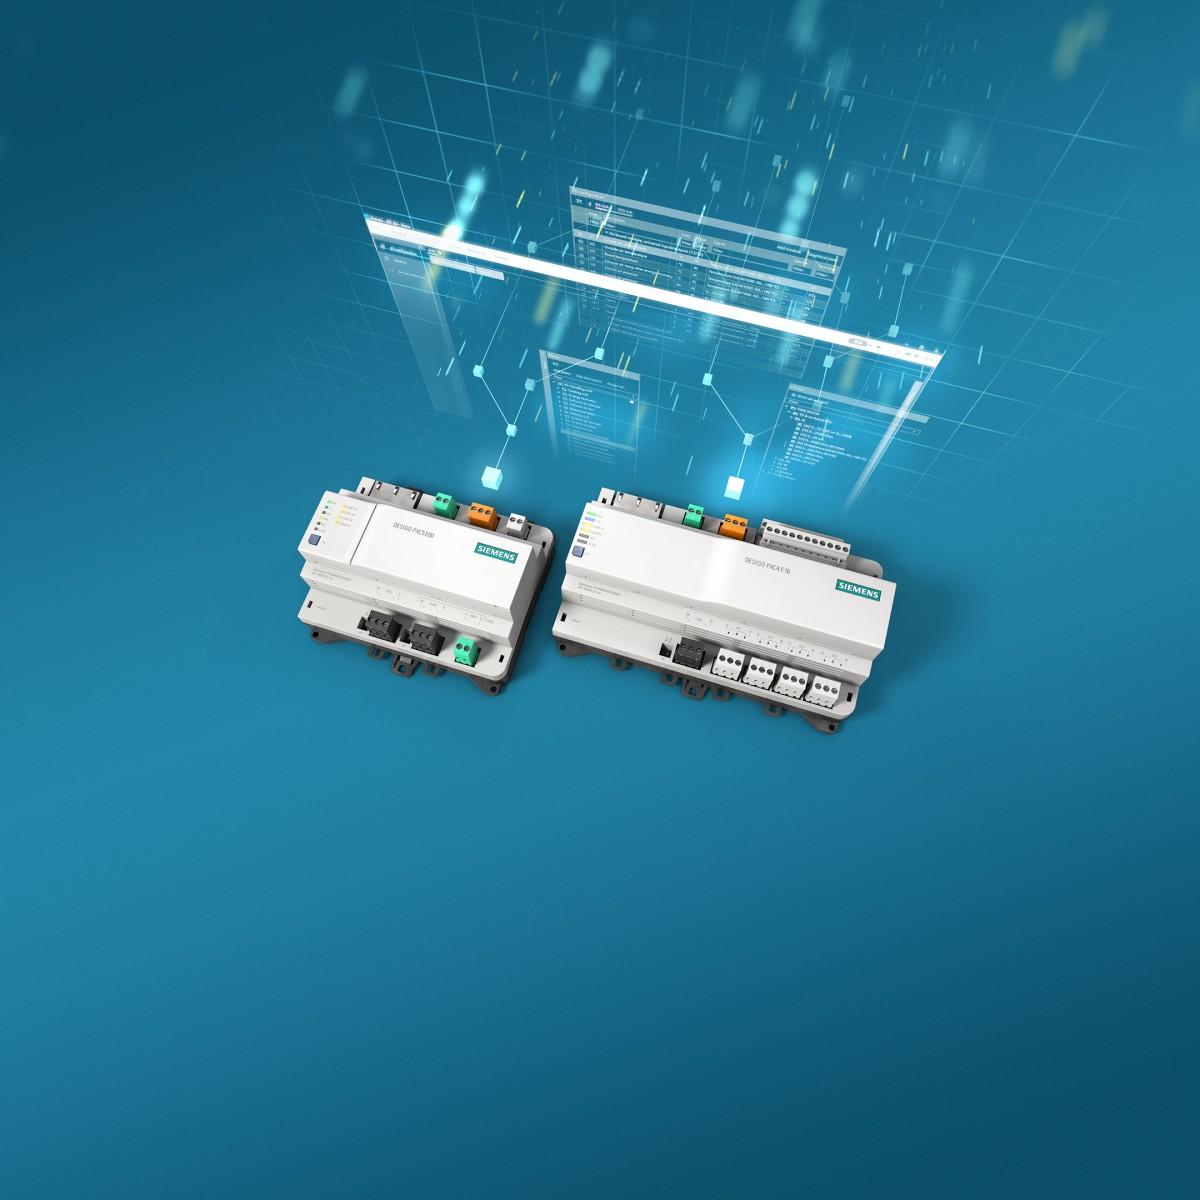 Siemens' new Desigo controllers transform buildings into high-performing assets